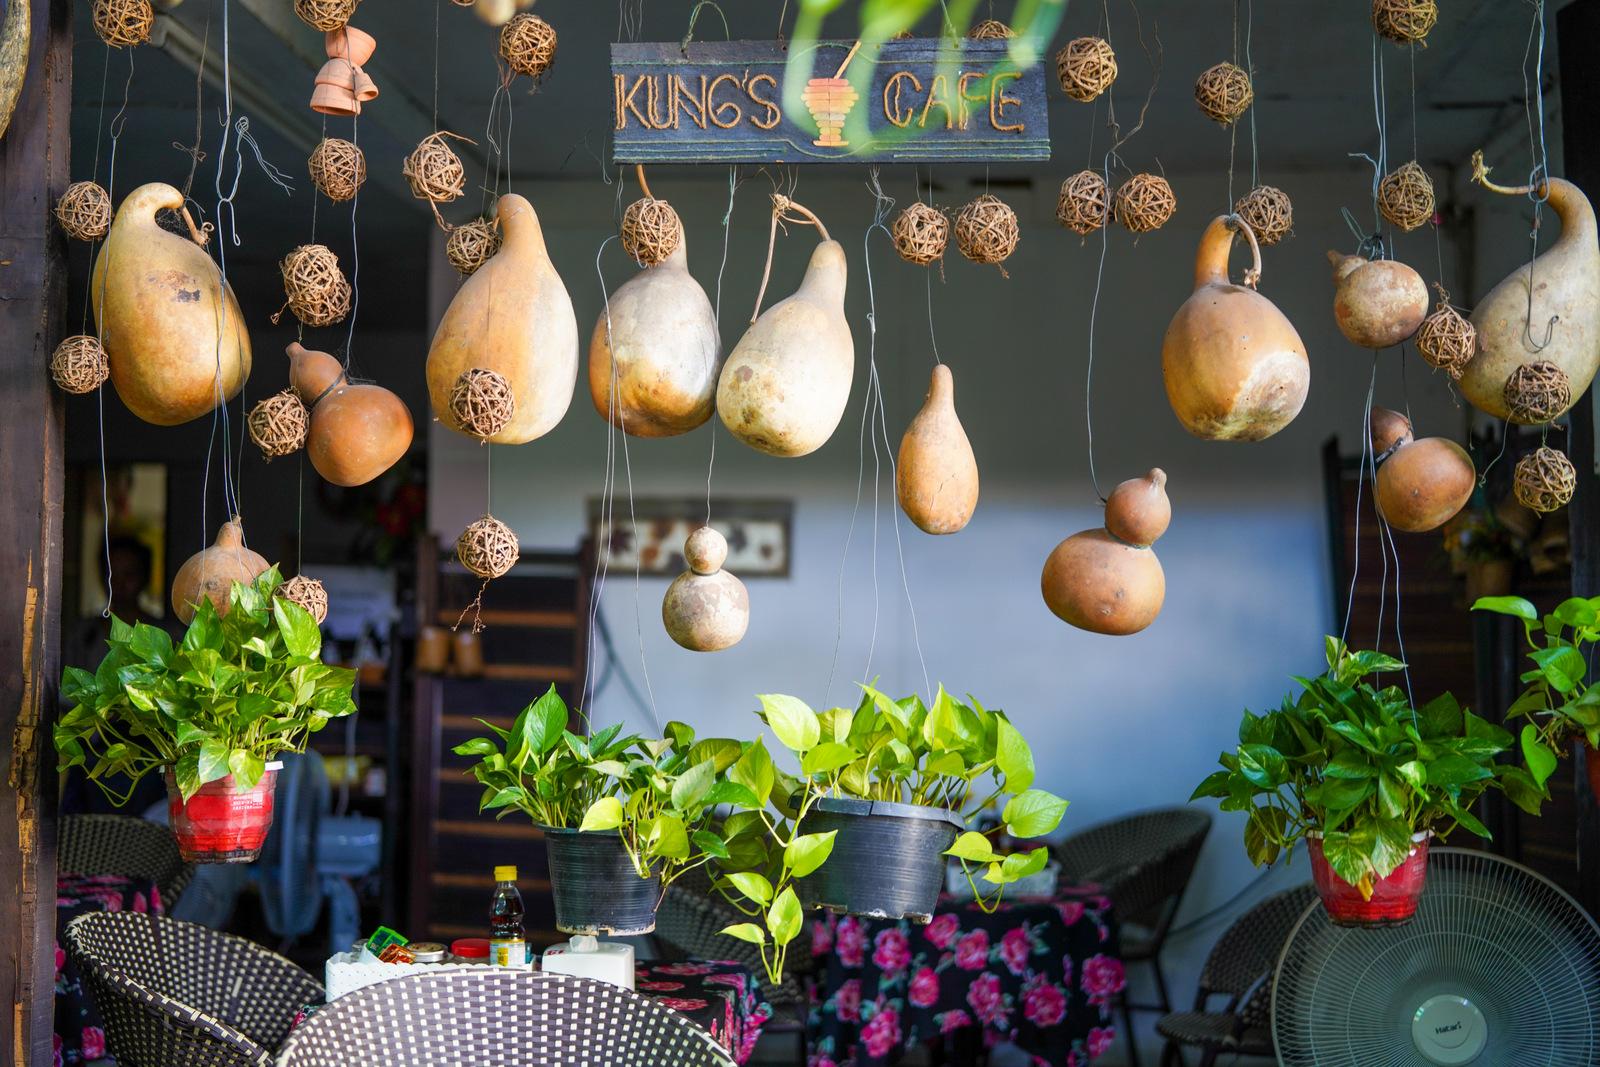 Kung's Cafe, Laos